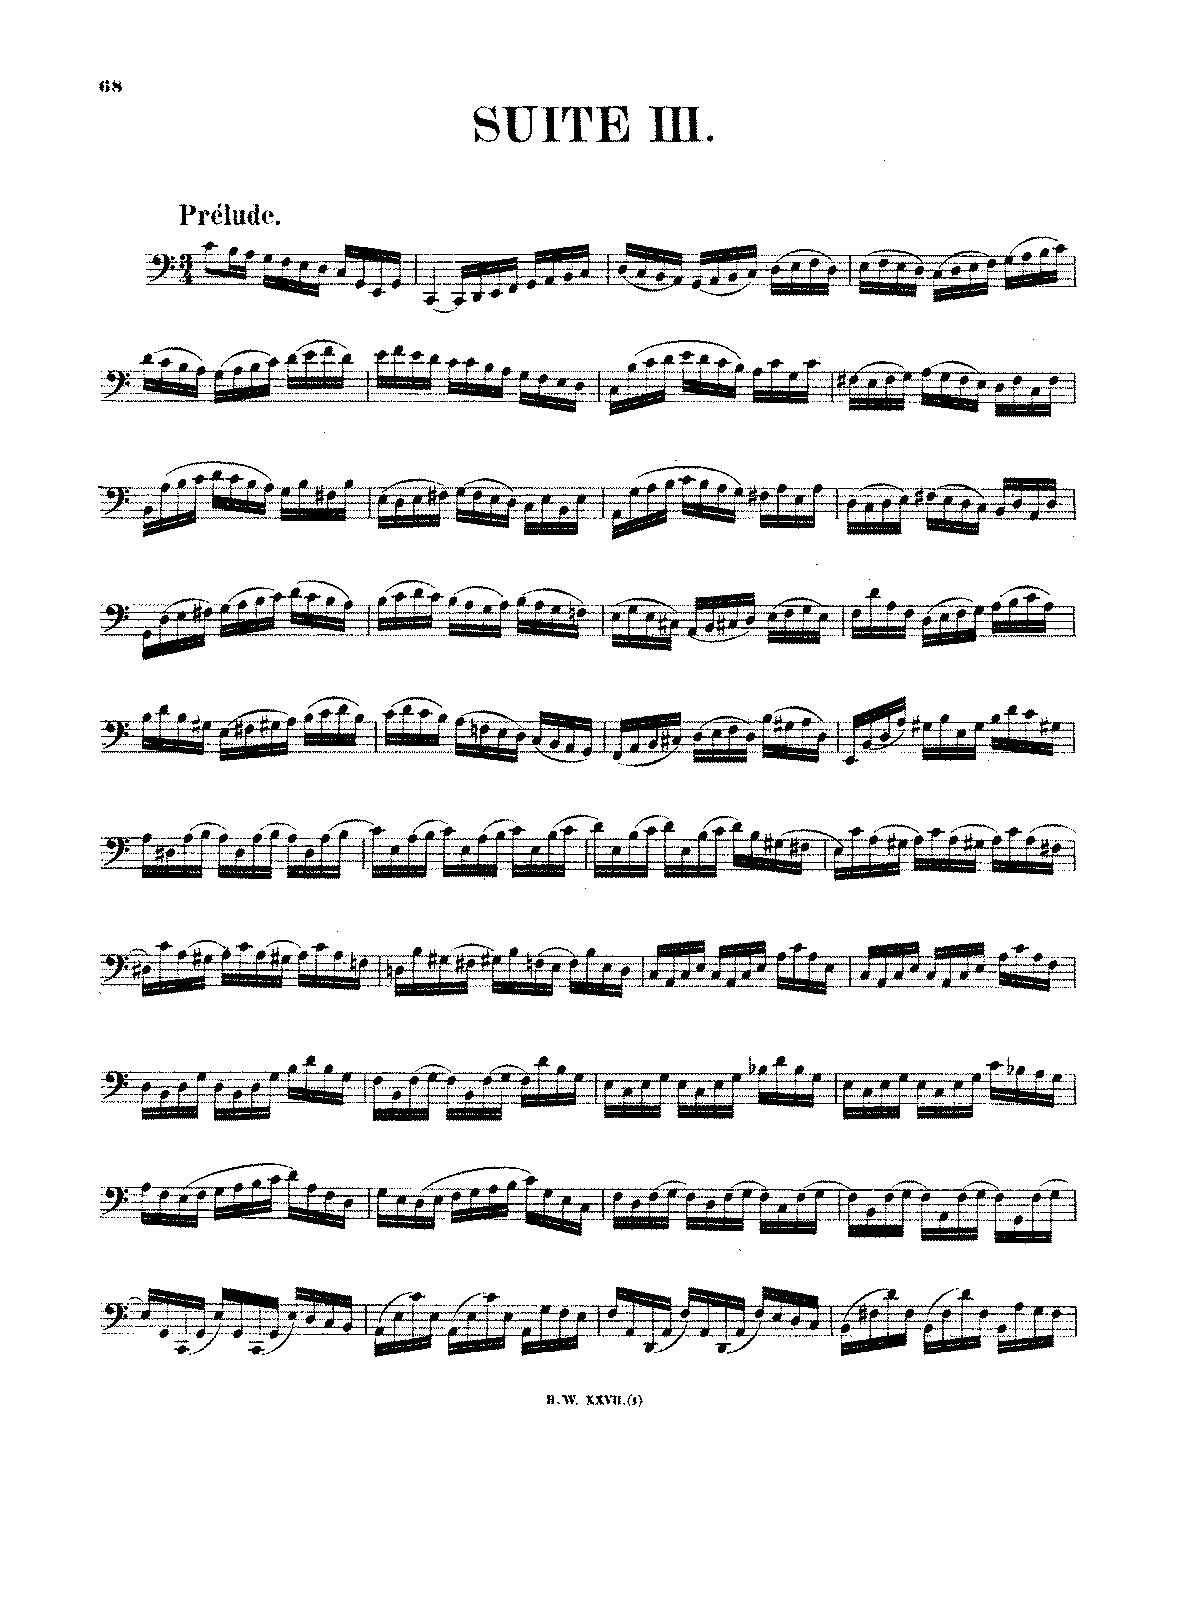 Cello Suite No 3 in C major, BWV 1009 (Bach, Johann